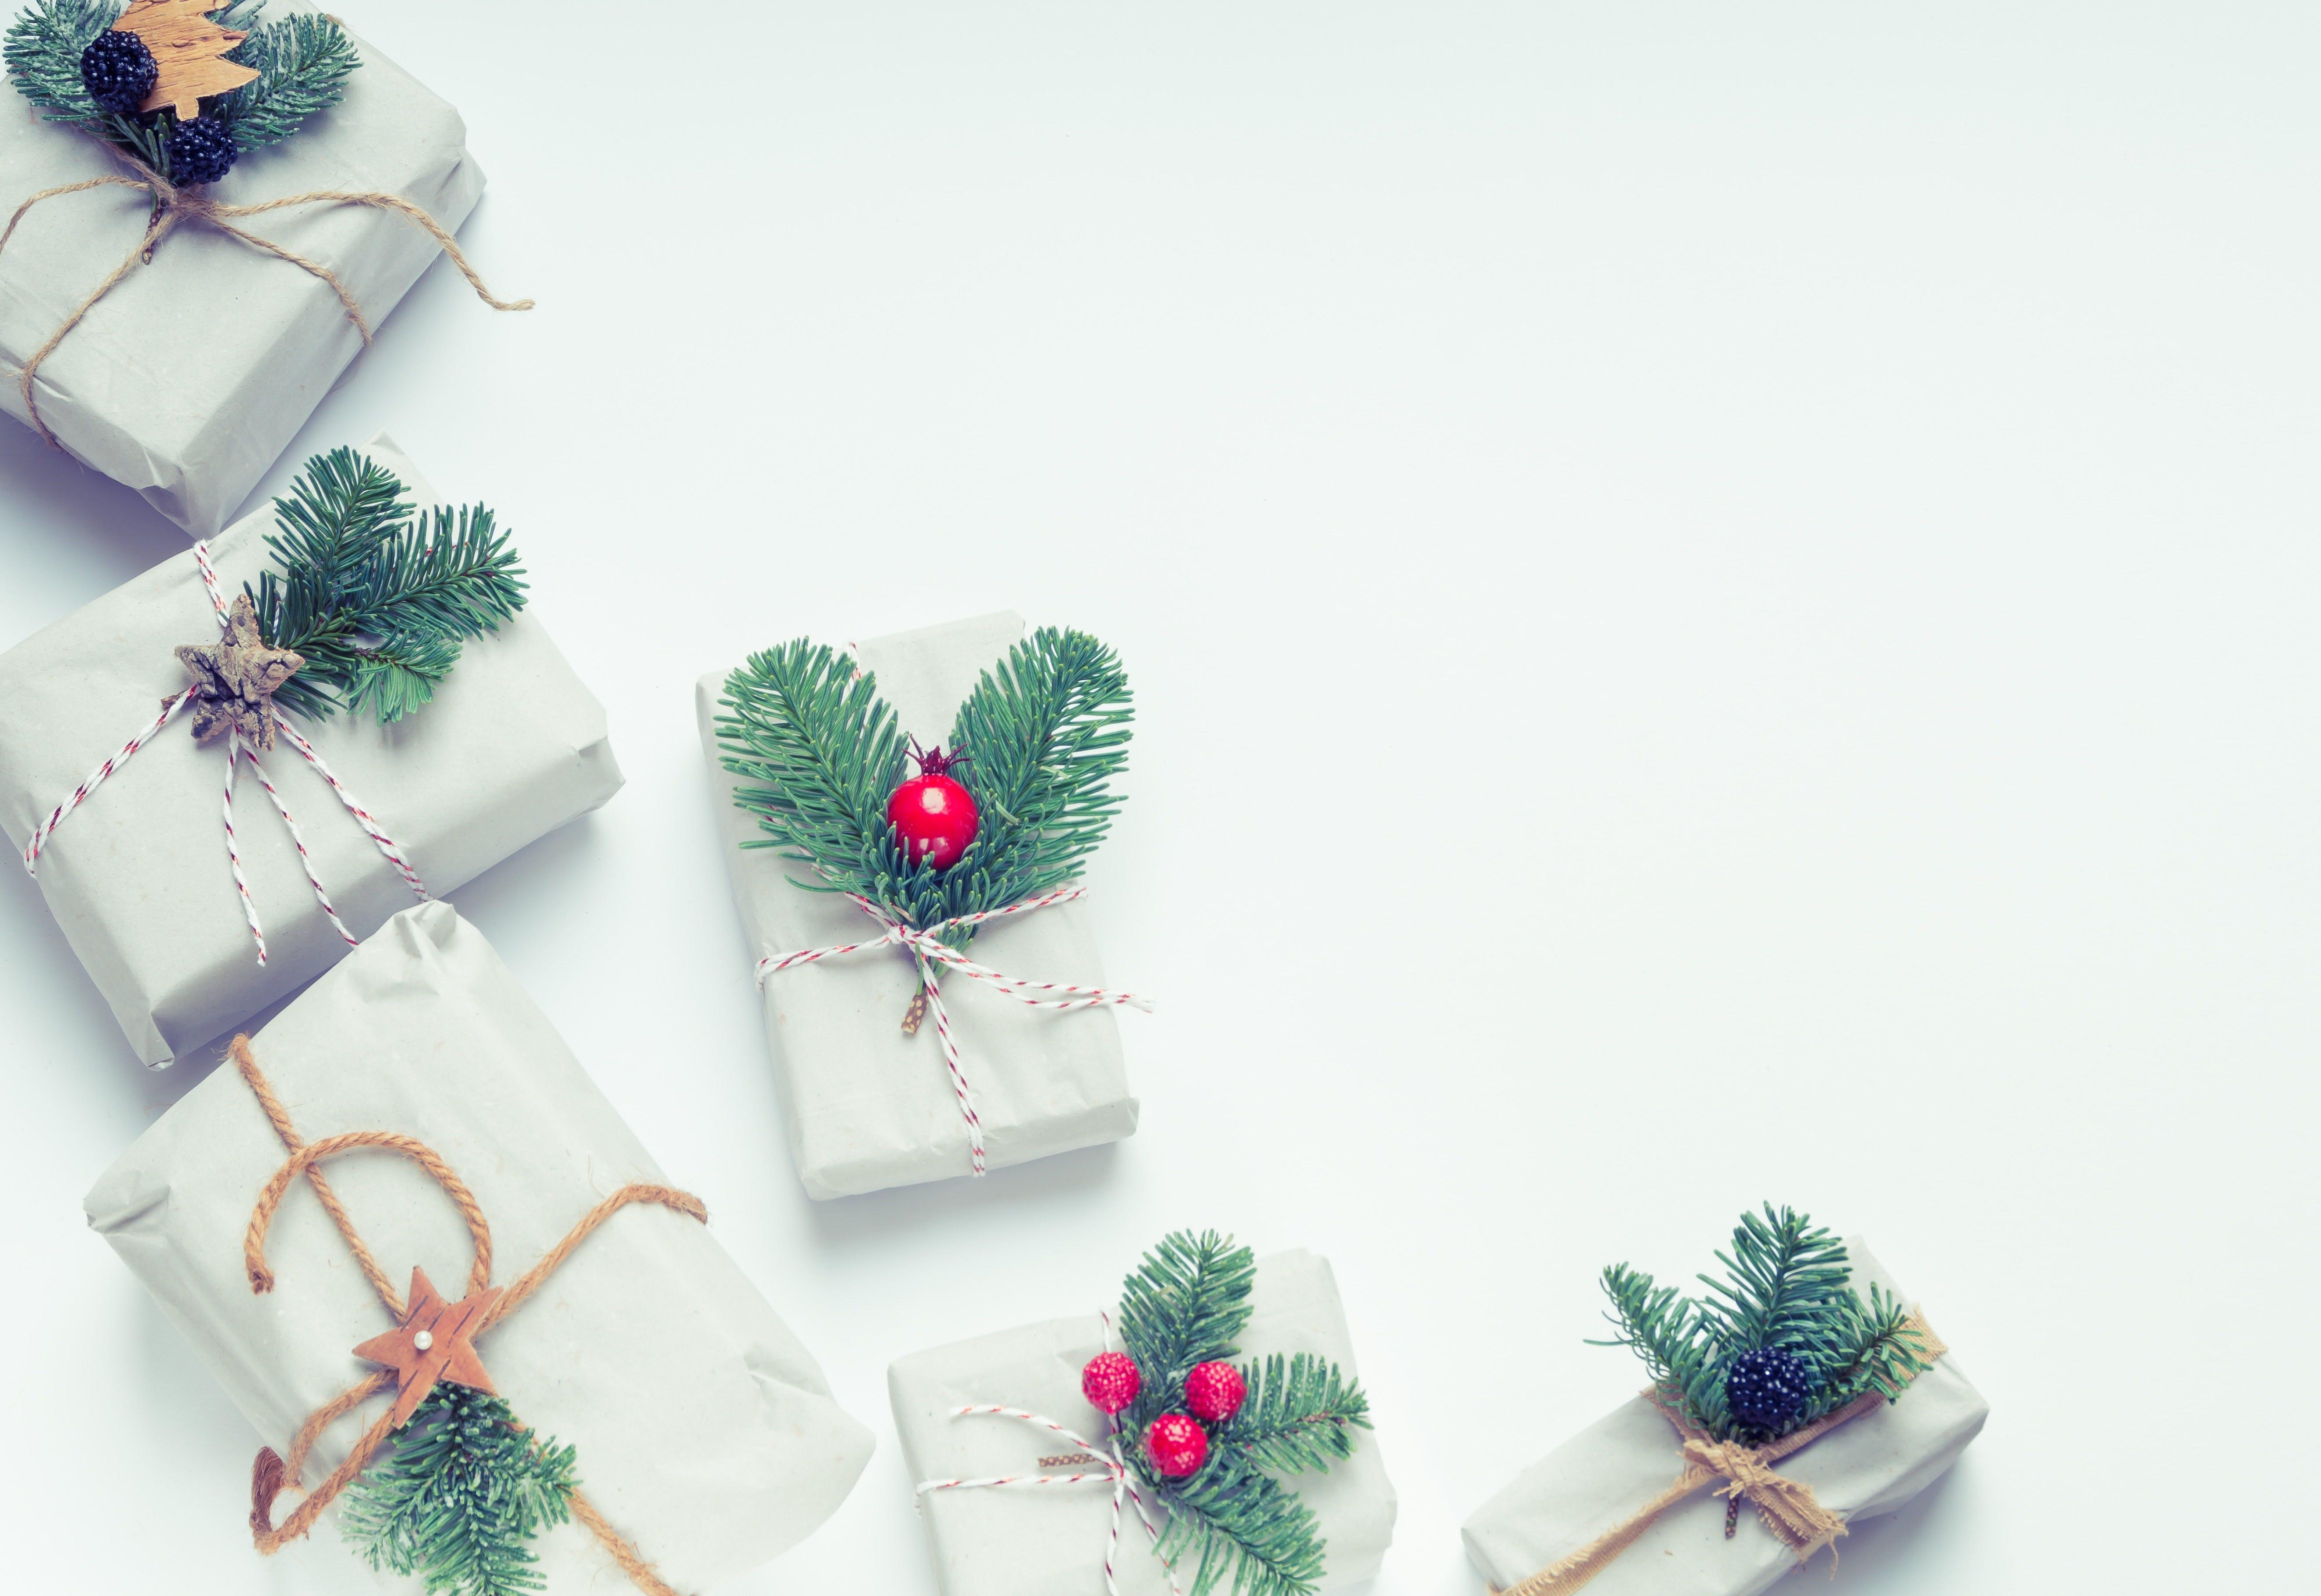 jul mandelgave ideer gaver julegaver